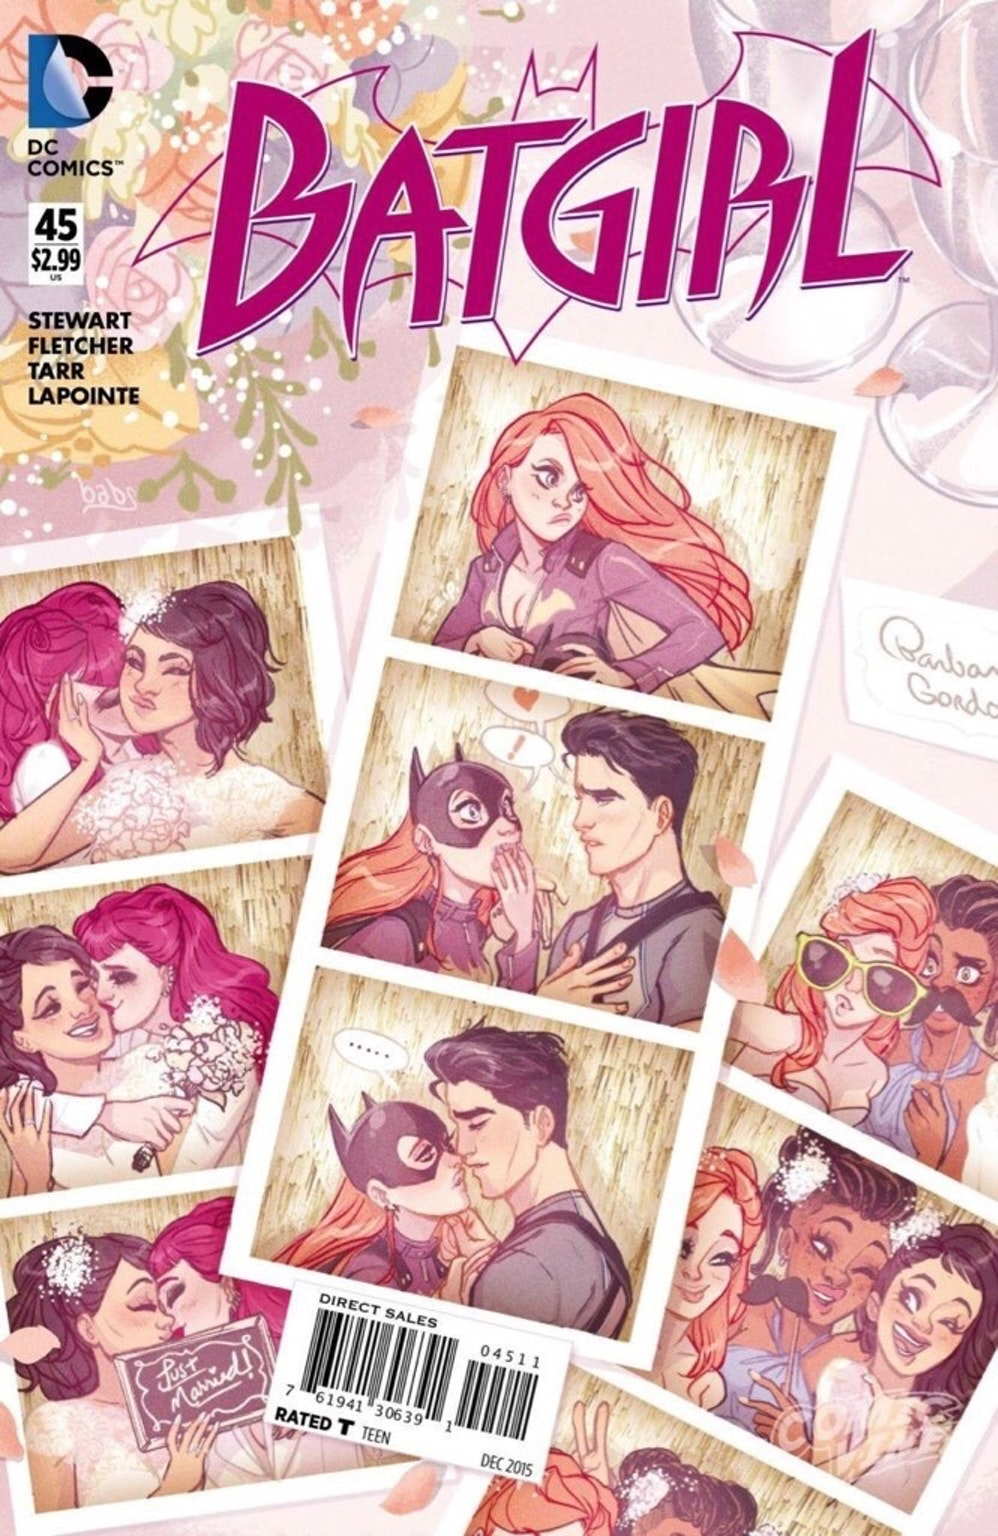 'Batgirl' #45 Cover